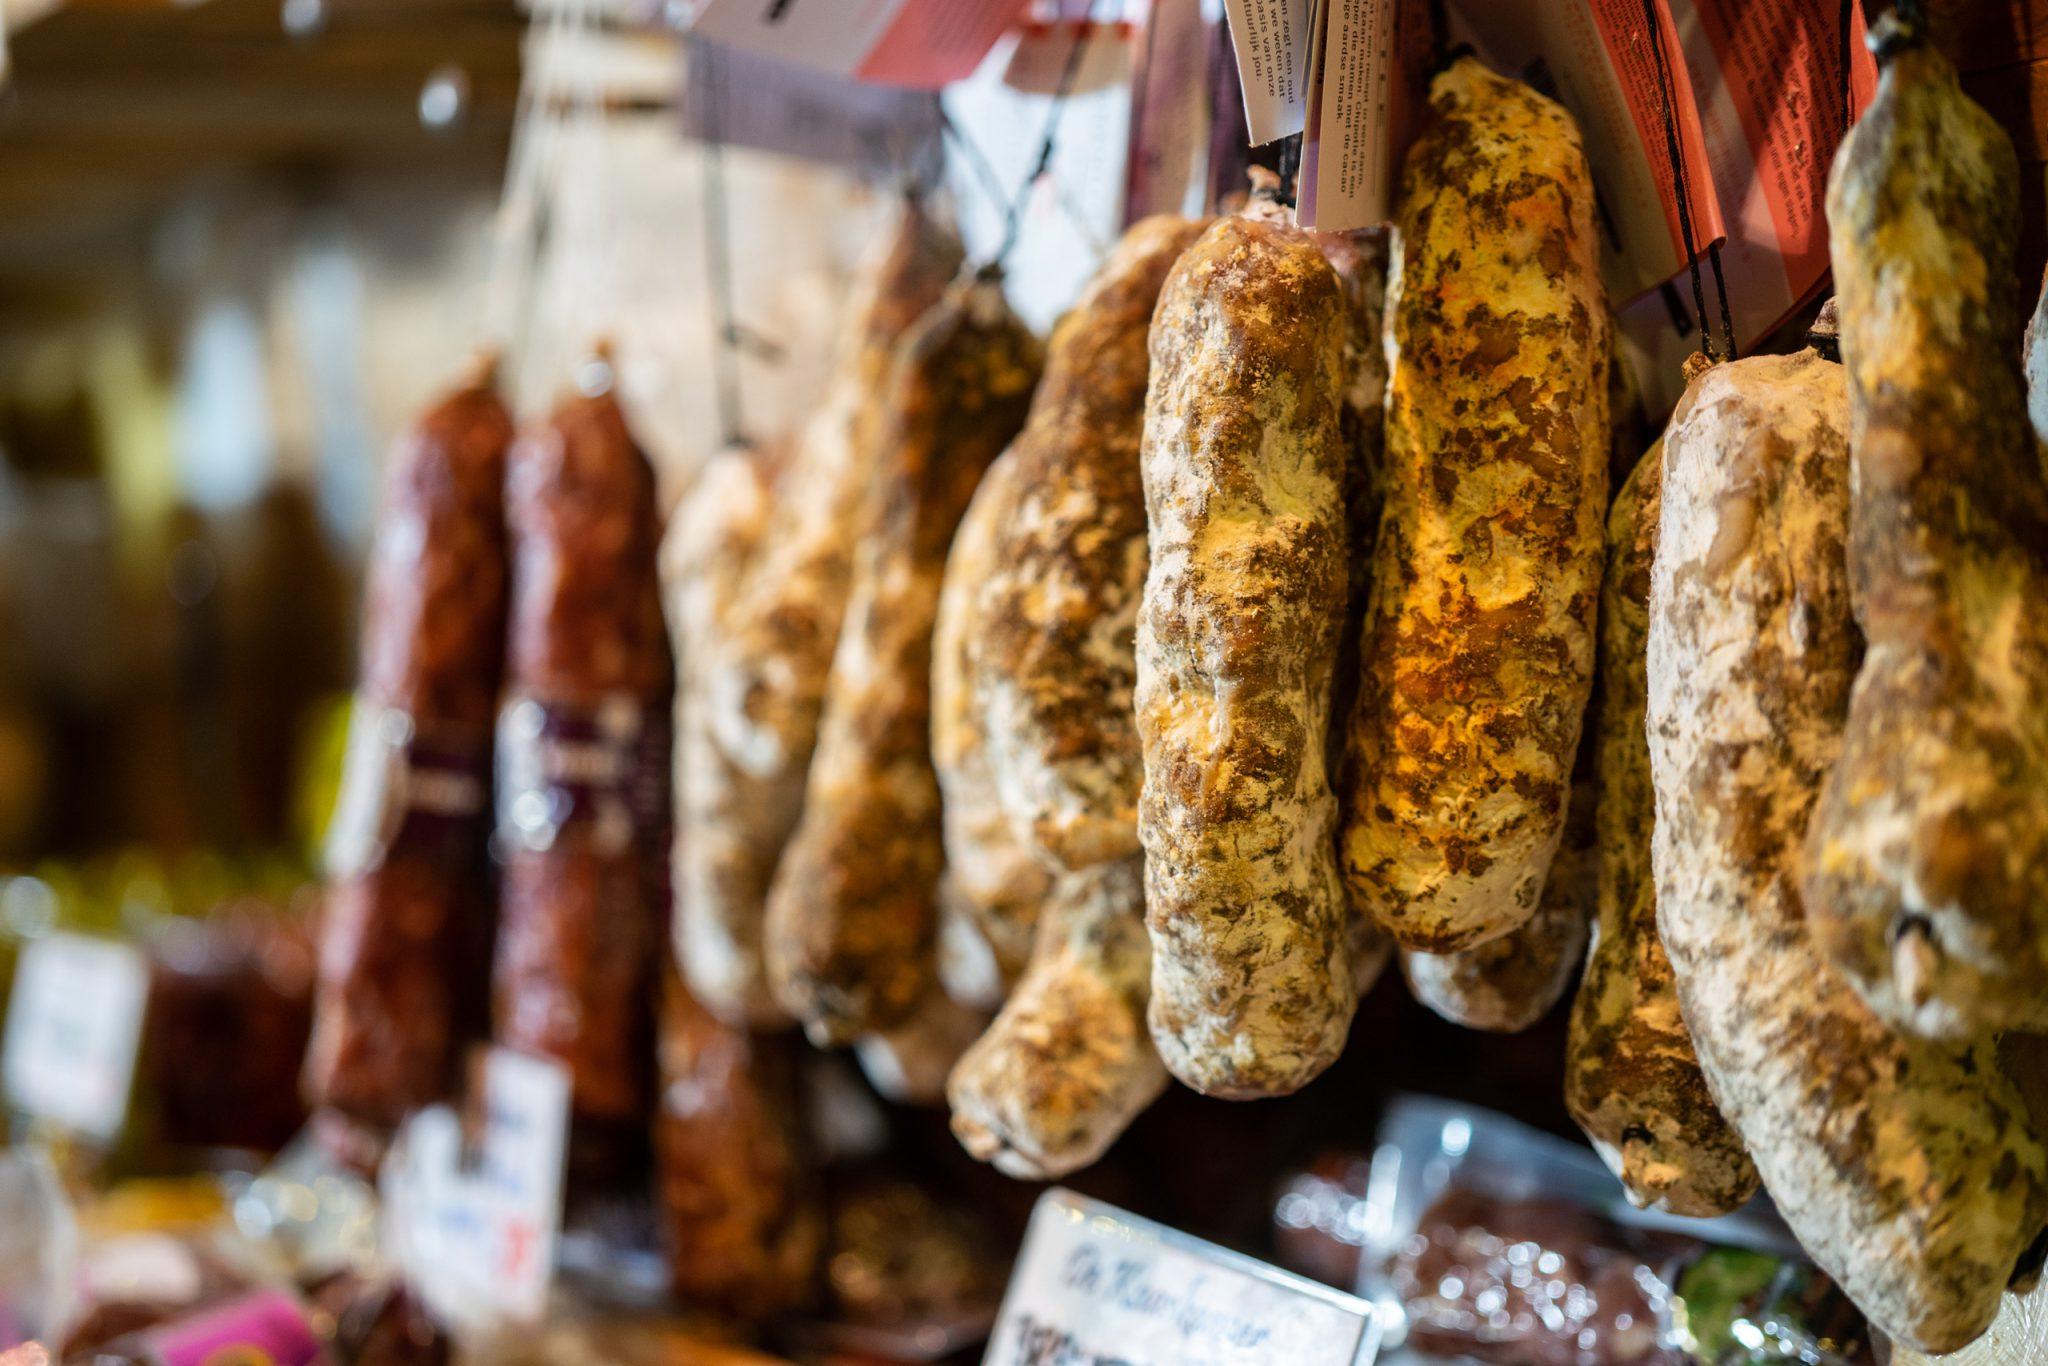 kaaskamer-amsterdam-cheese-brandt-levie-sausage